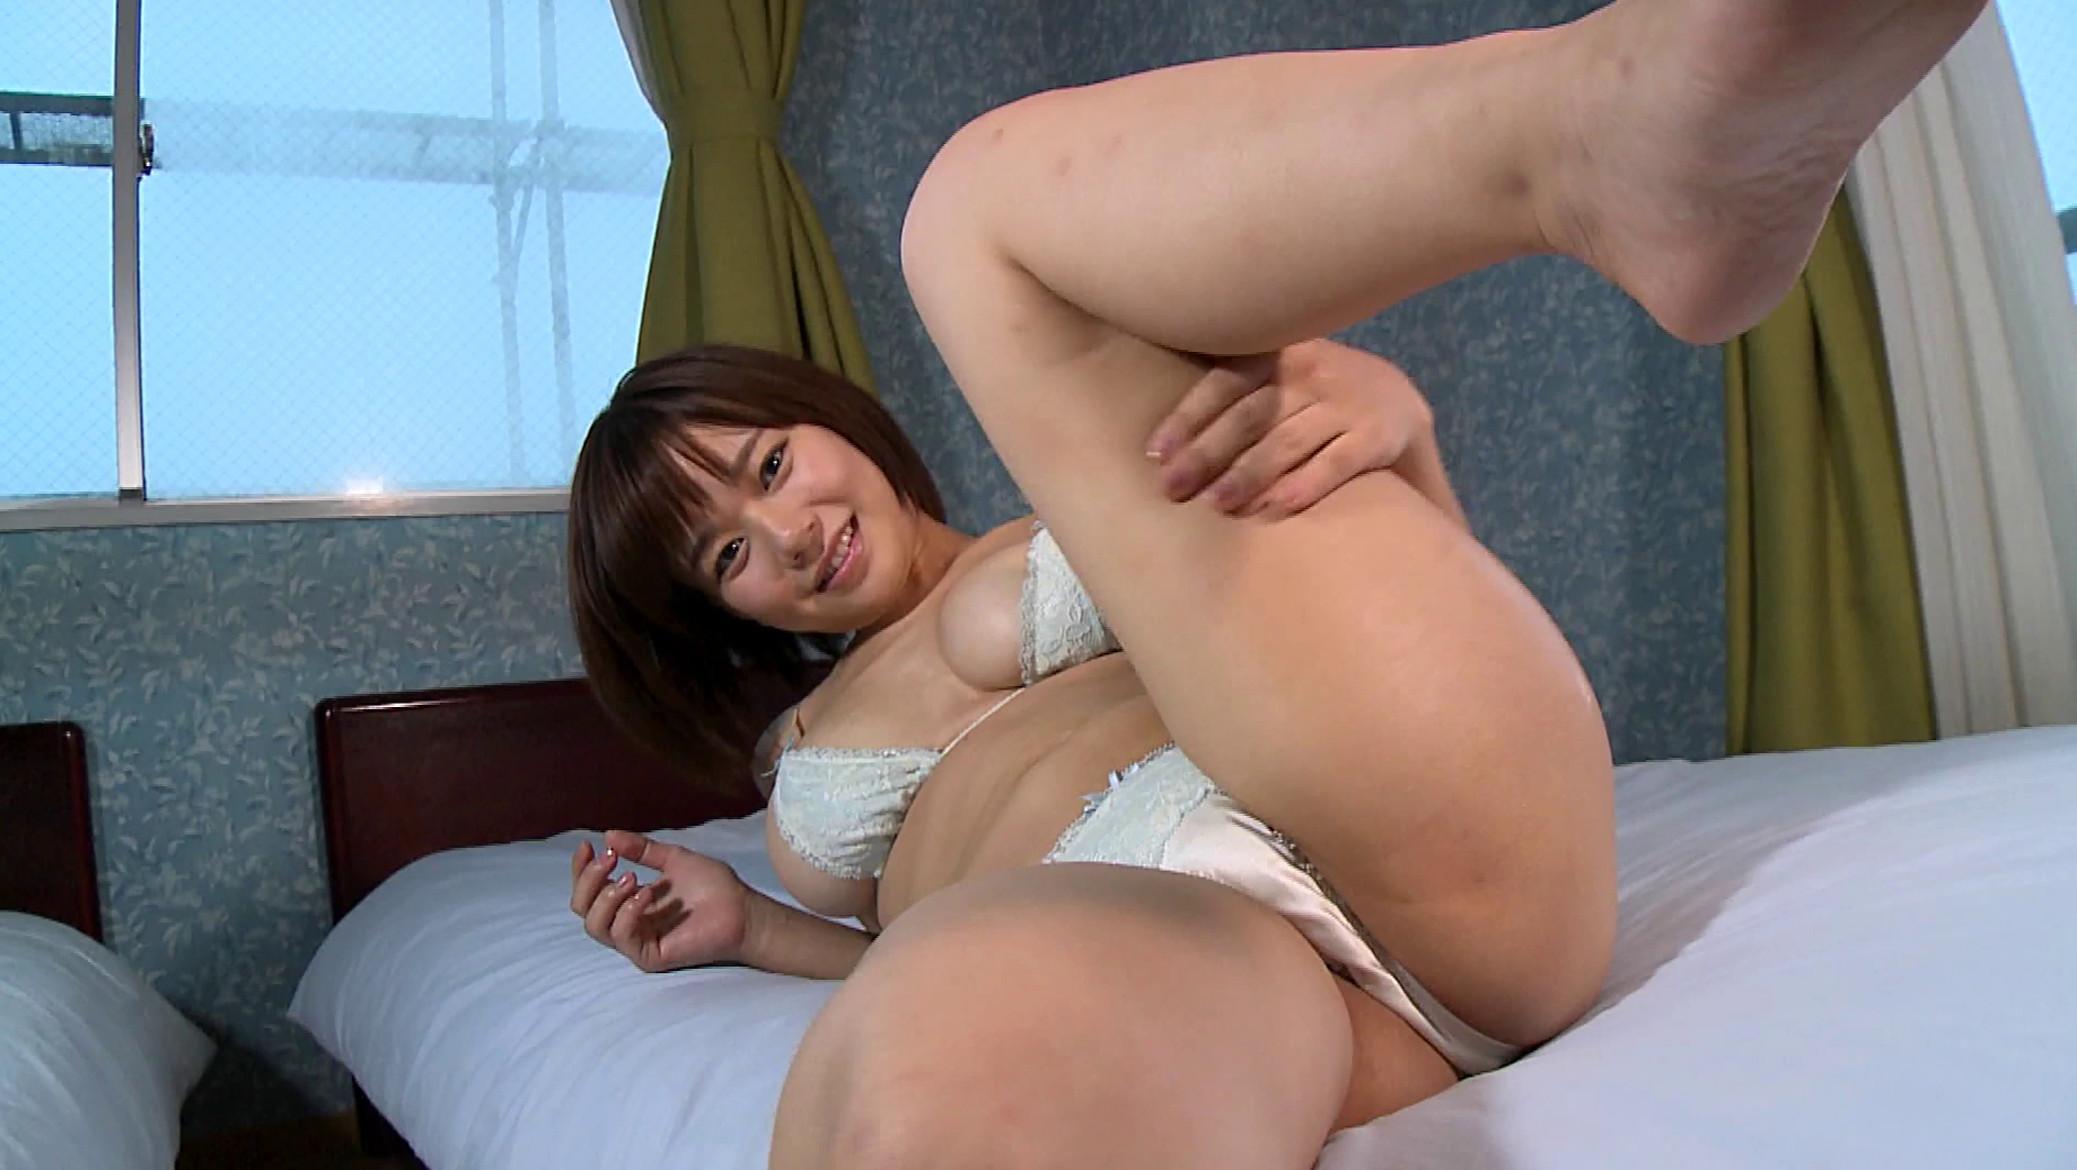 Tsukasa Wachi's sexy pics